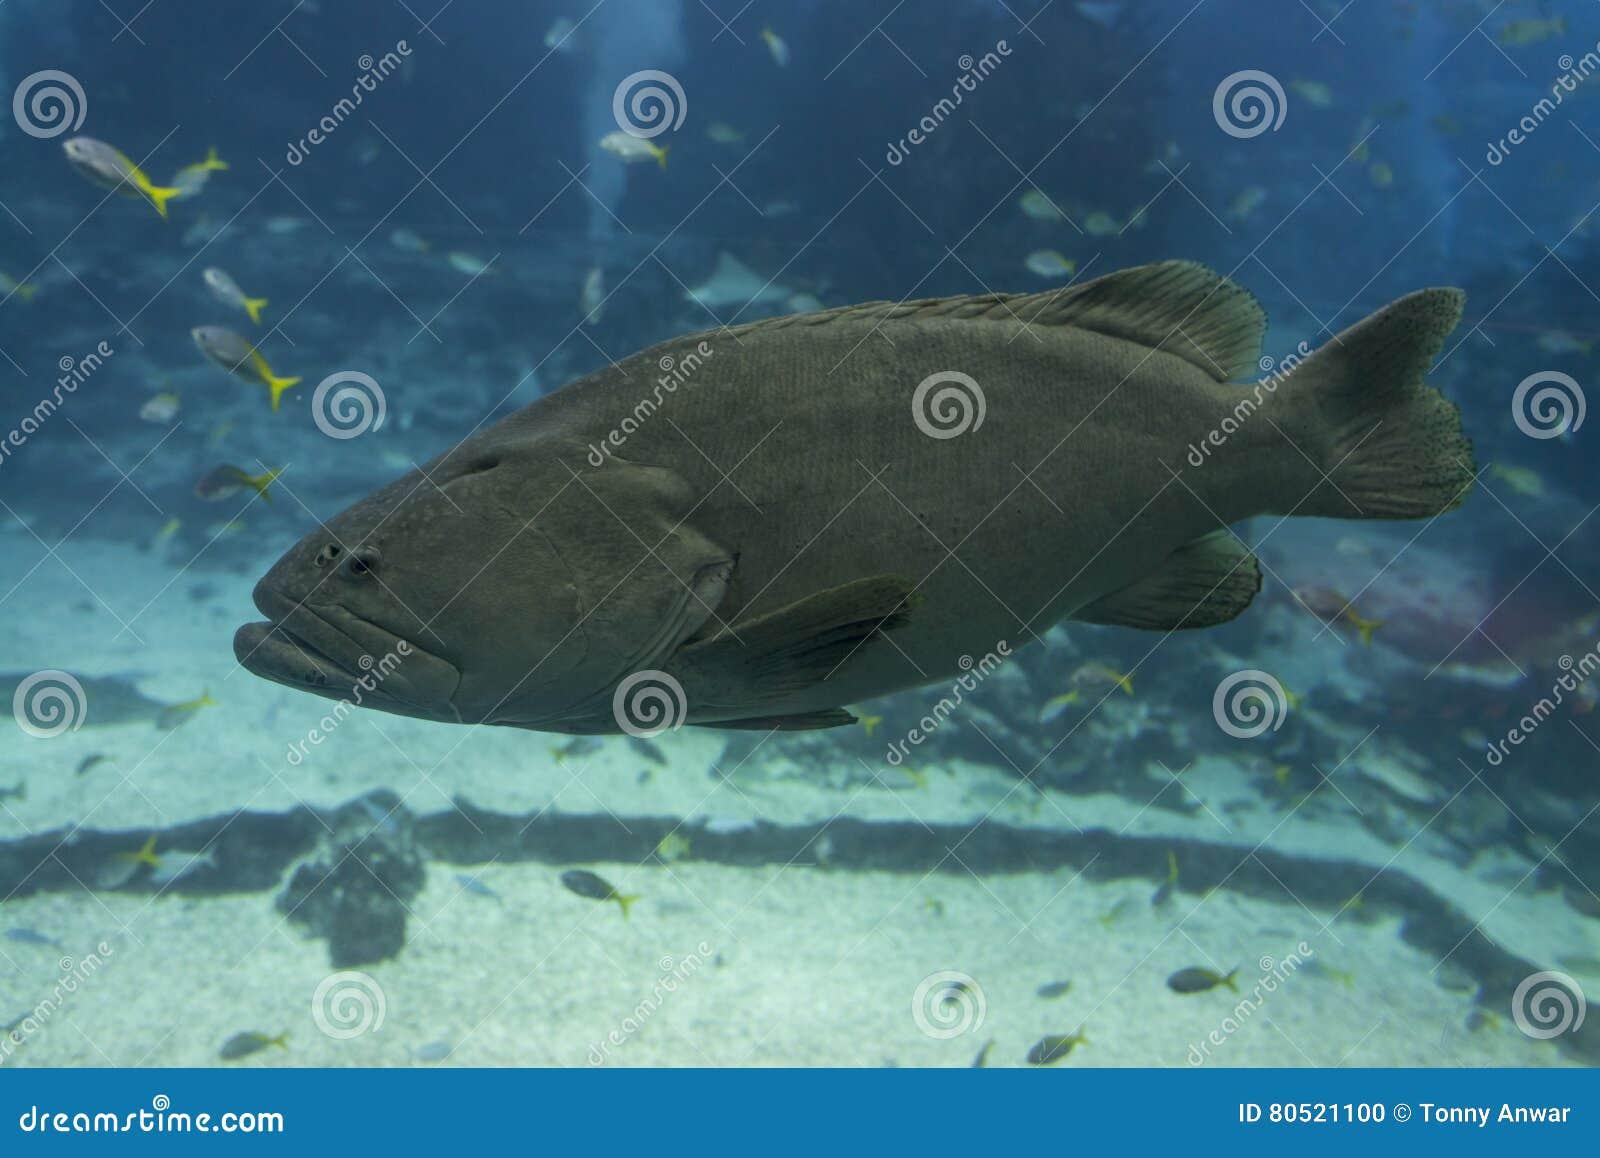 Goliath Grouper Stock Photo Image Of Fish Achovy Symbiosis 80521100